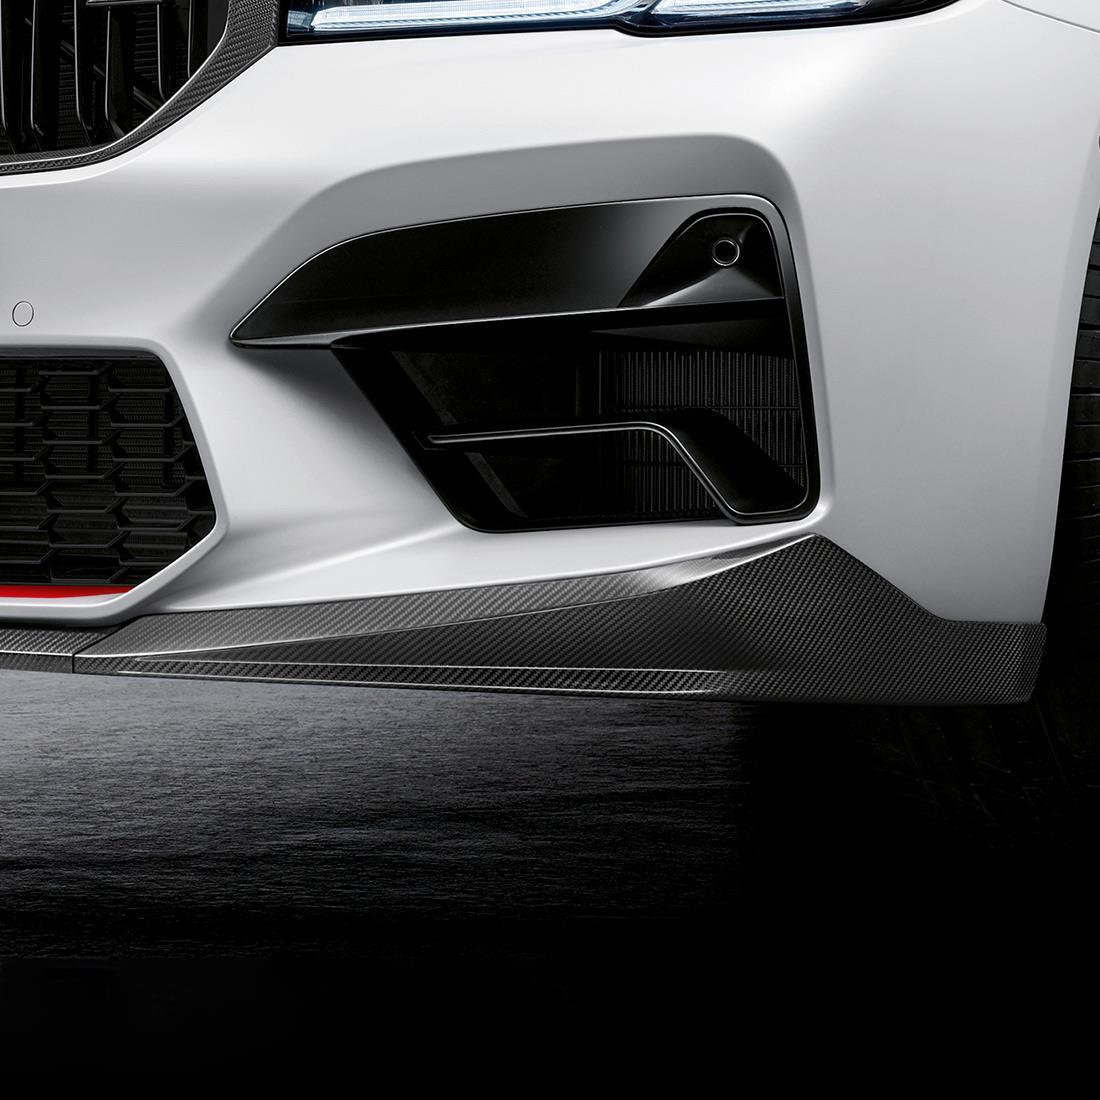 M Performance Front attachment in carbon fiber